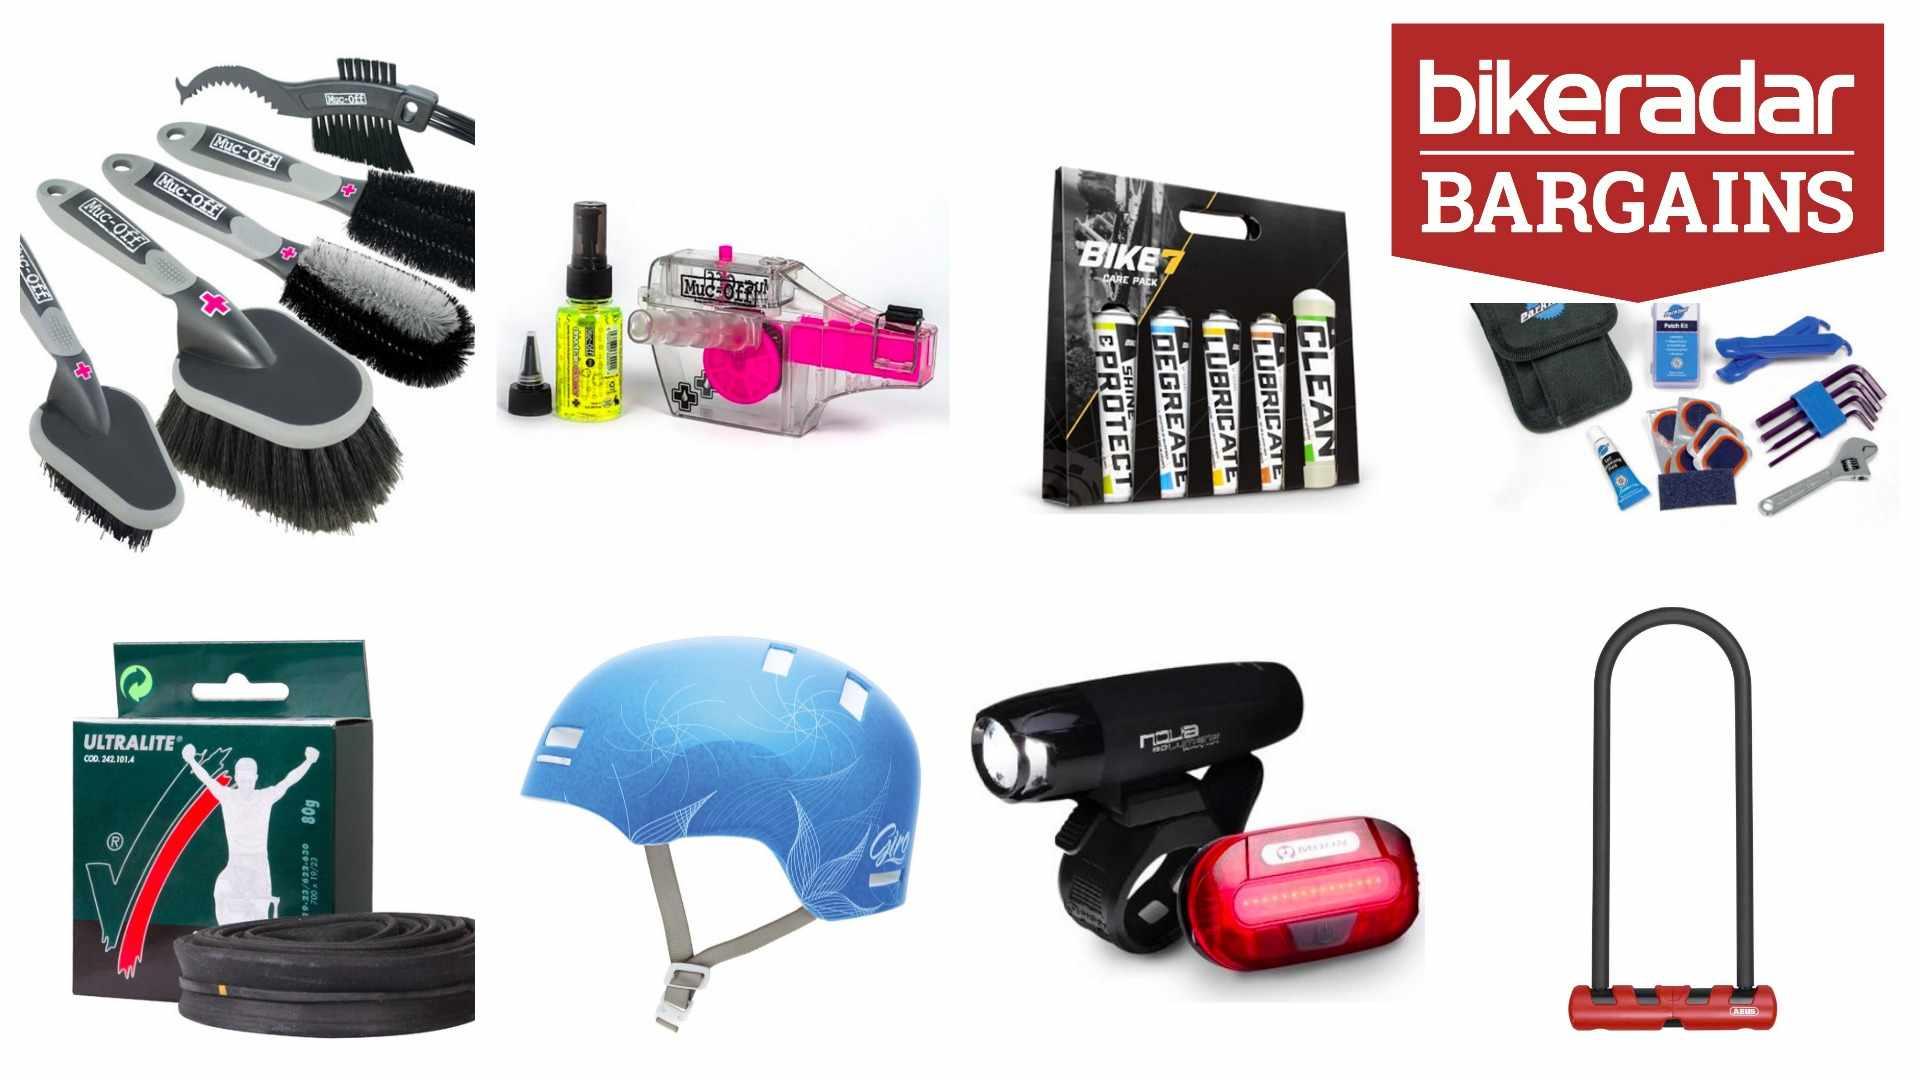 BikeRadar Bargains - 10 treats under £20